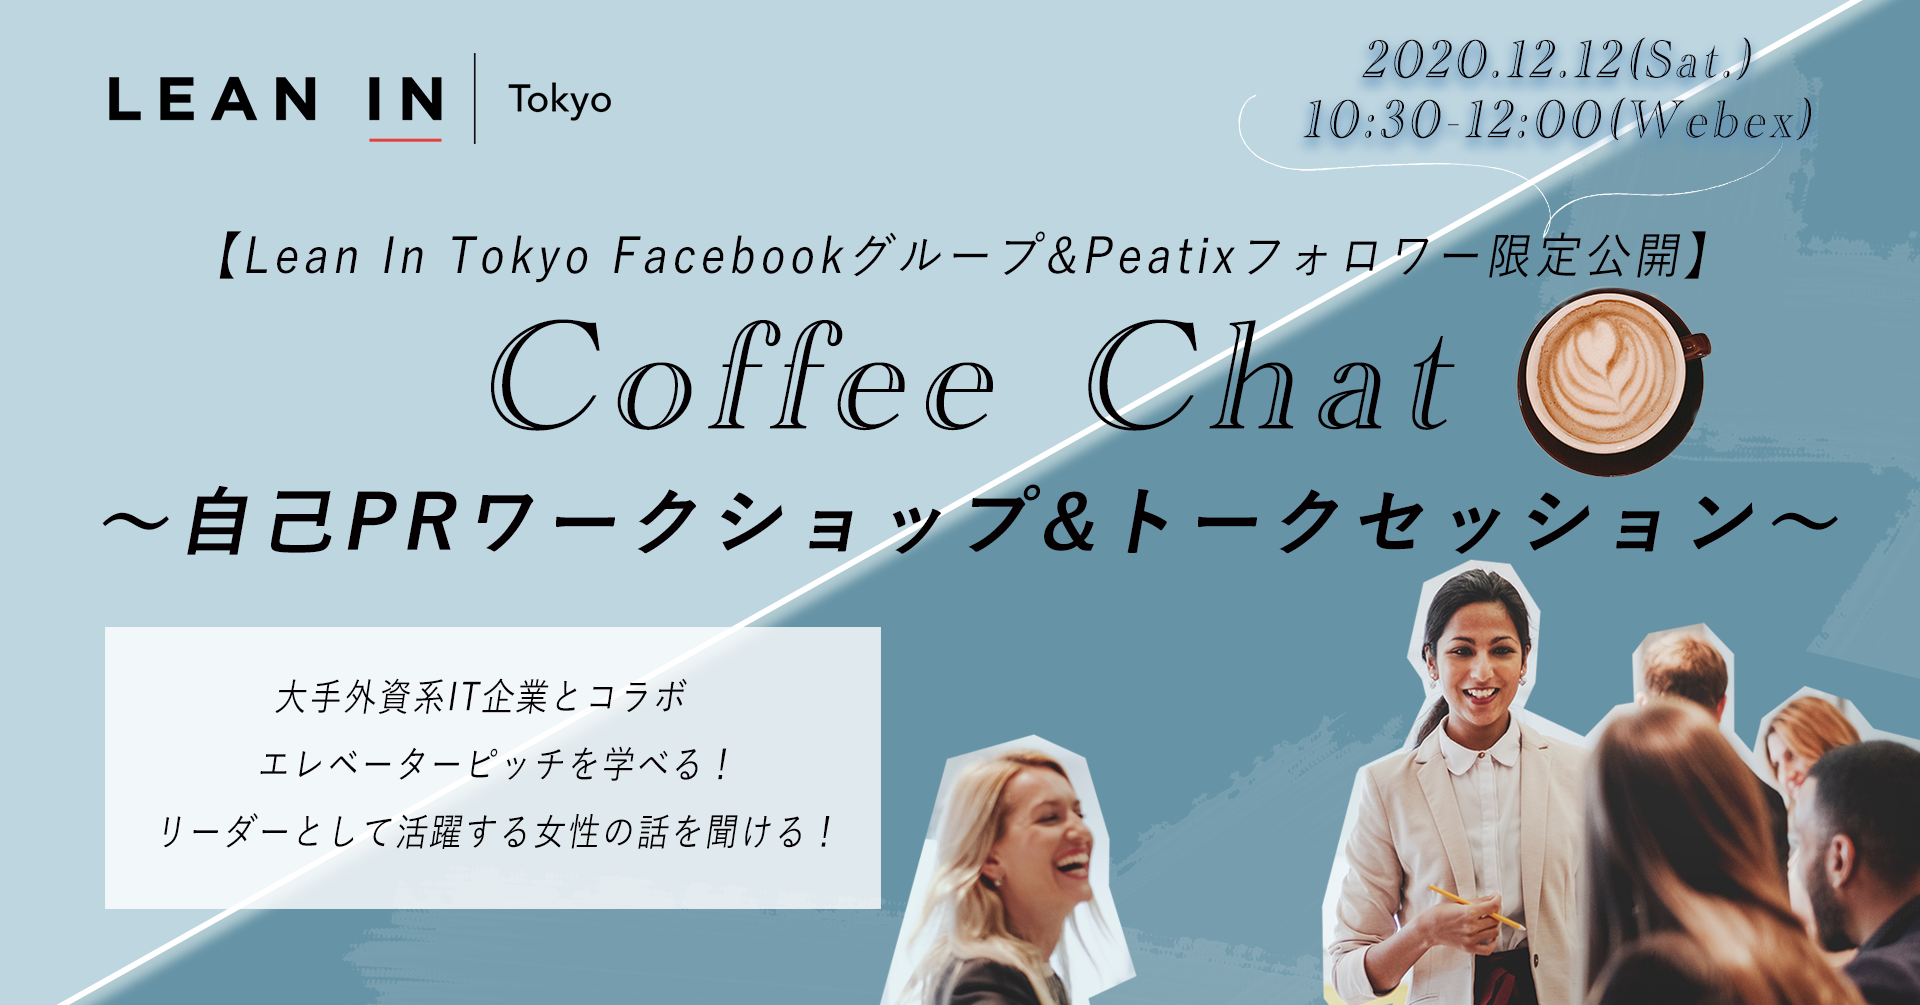 12/12 Lean In Tokyo Facebookグループ限定公開 Coffee Chat〜自己PRワークショップ&トークセッション〜 イベントレポート